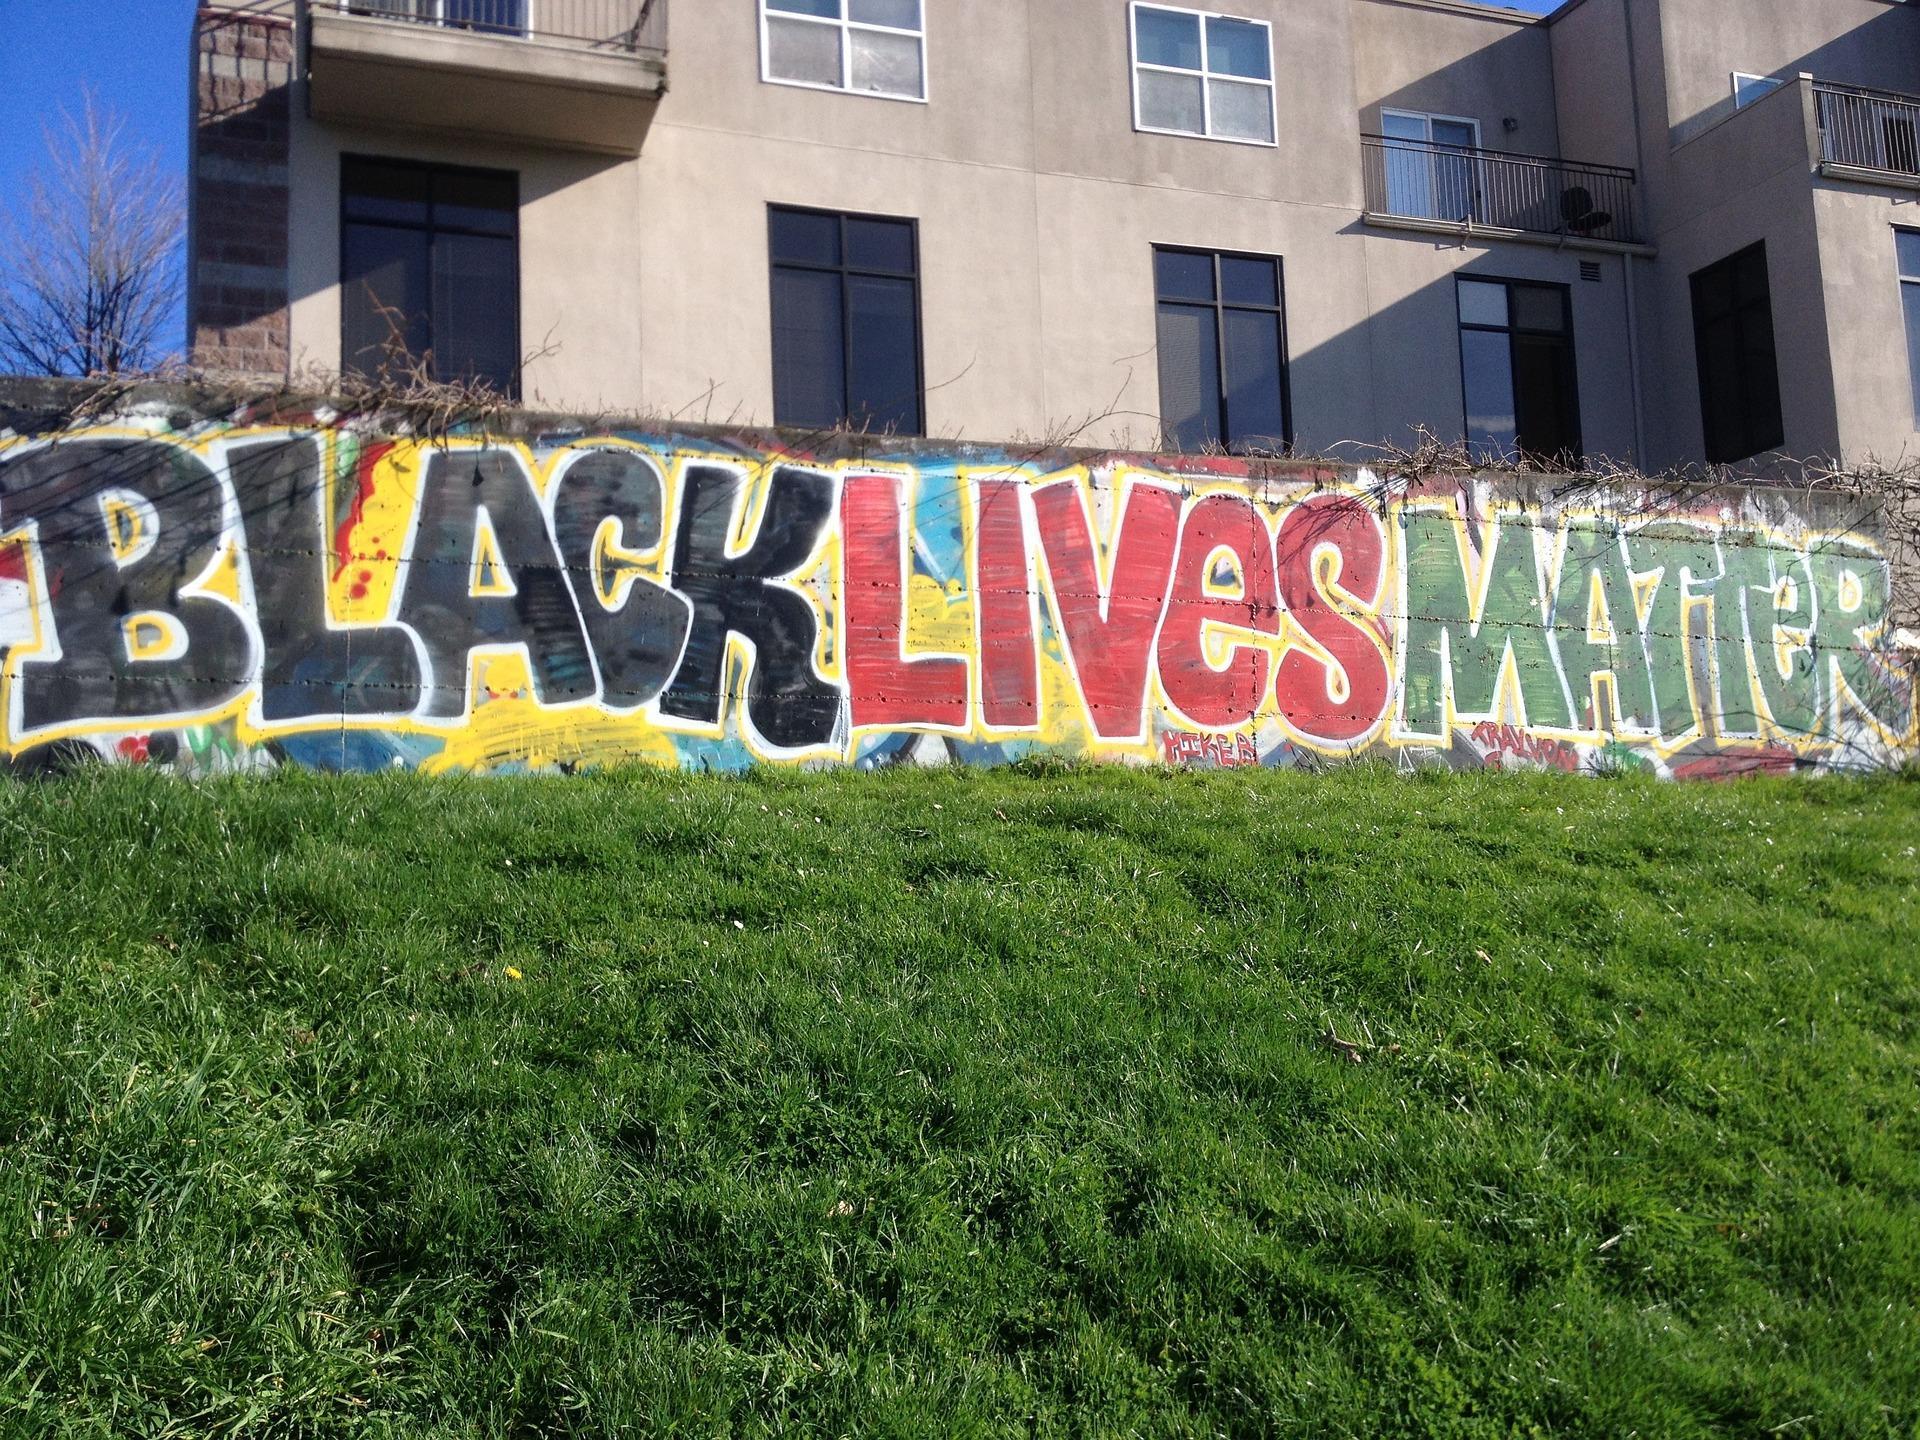 Black Lives Matter billboard in Seattle. From Pixabay